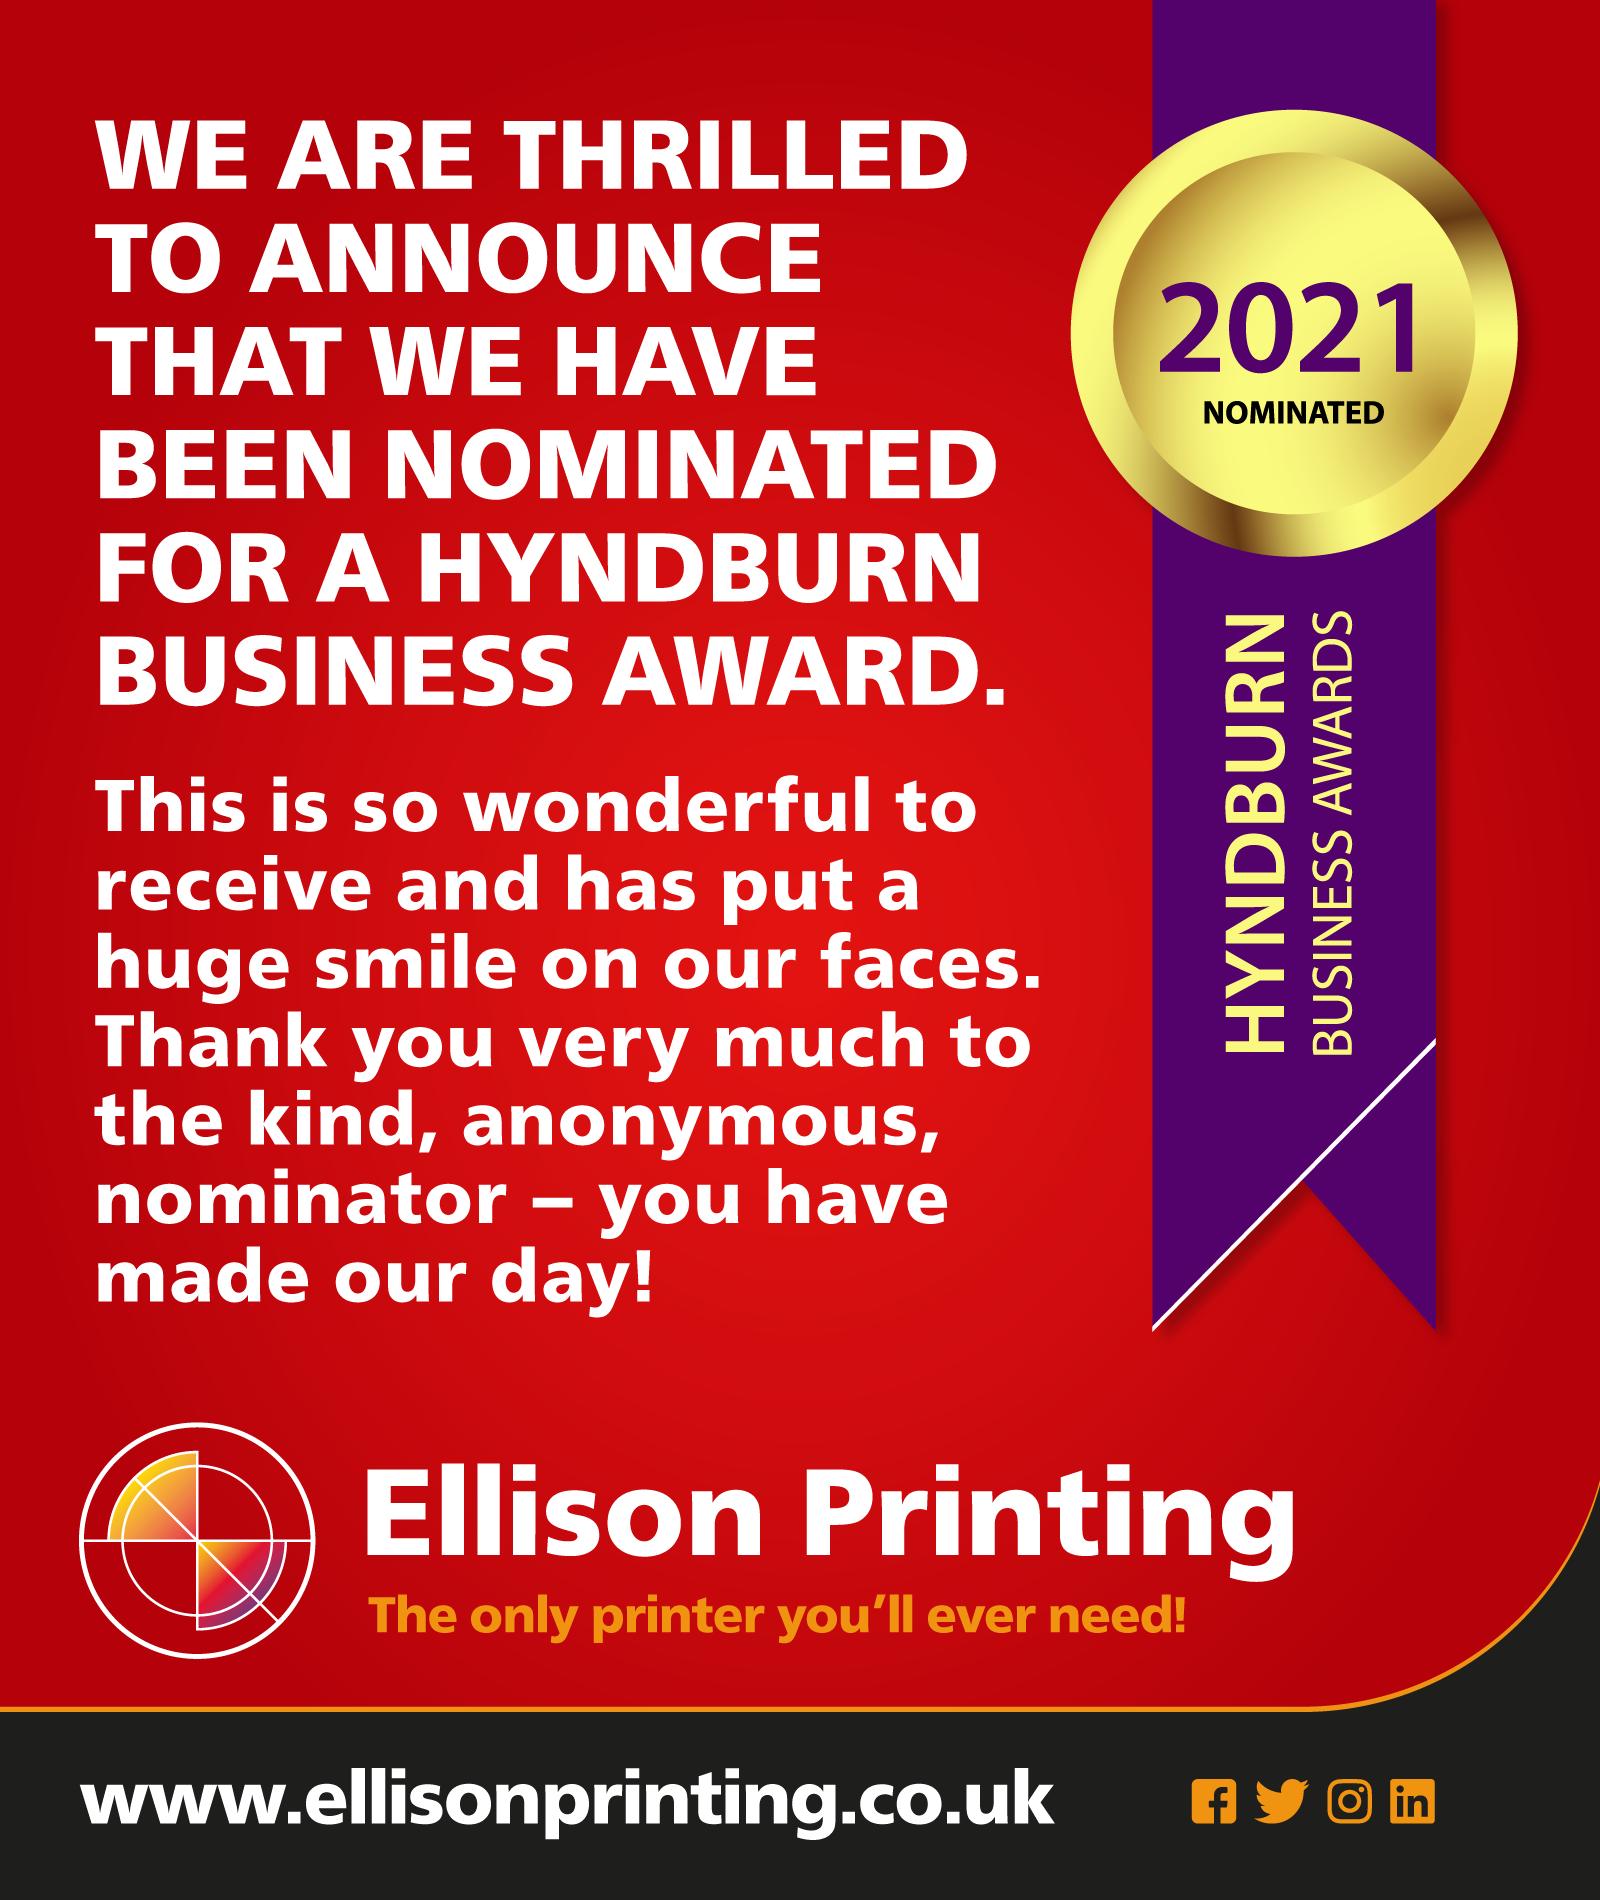 BUSINESS AWARDS NOMINATION